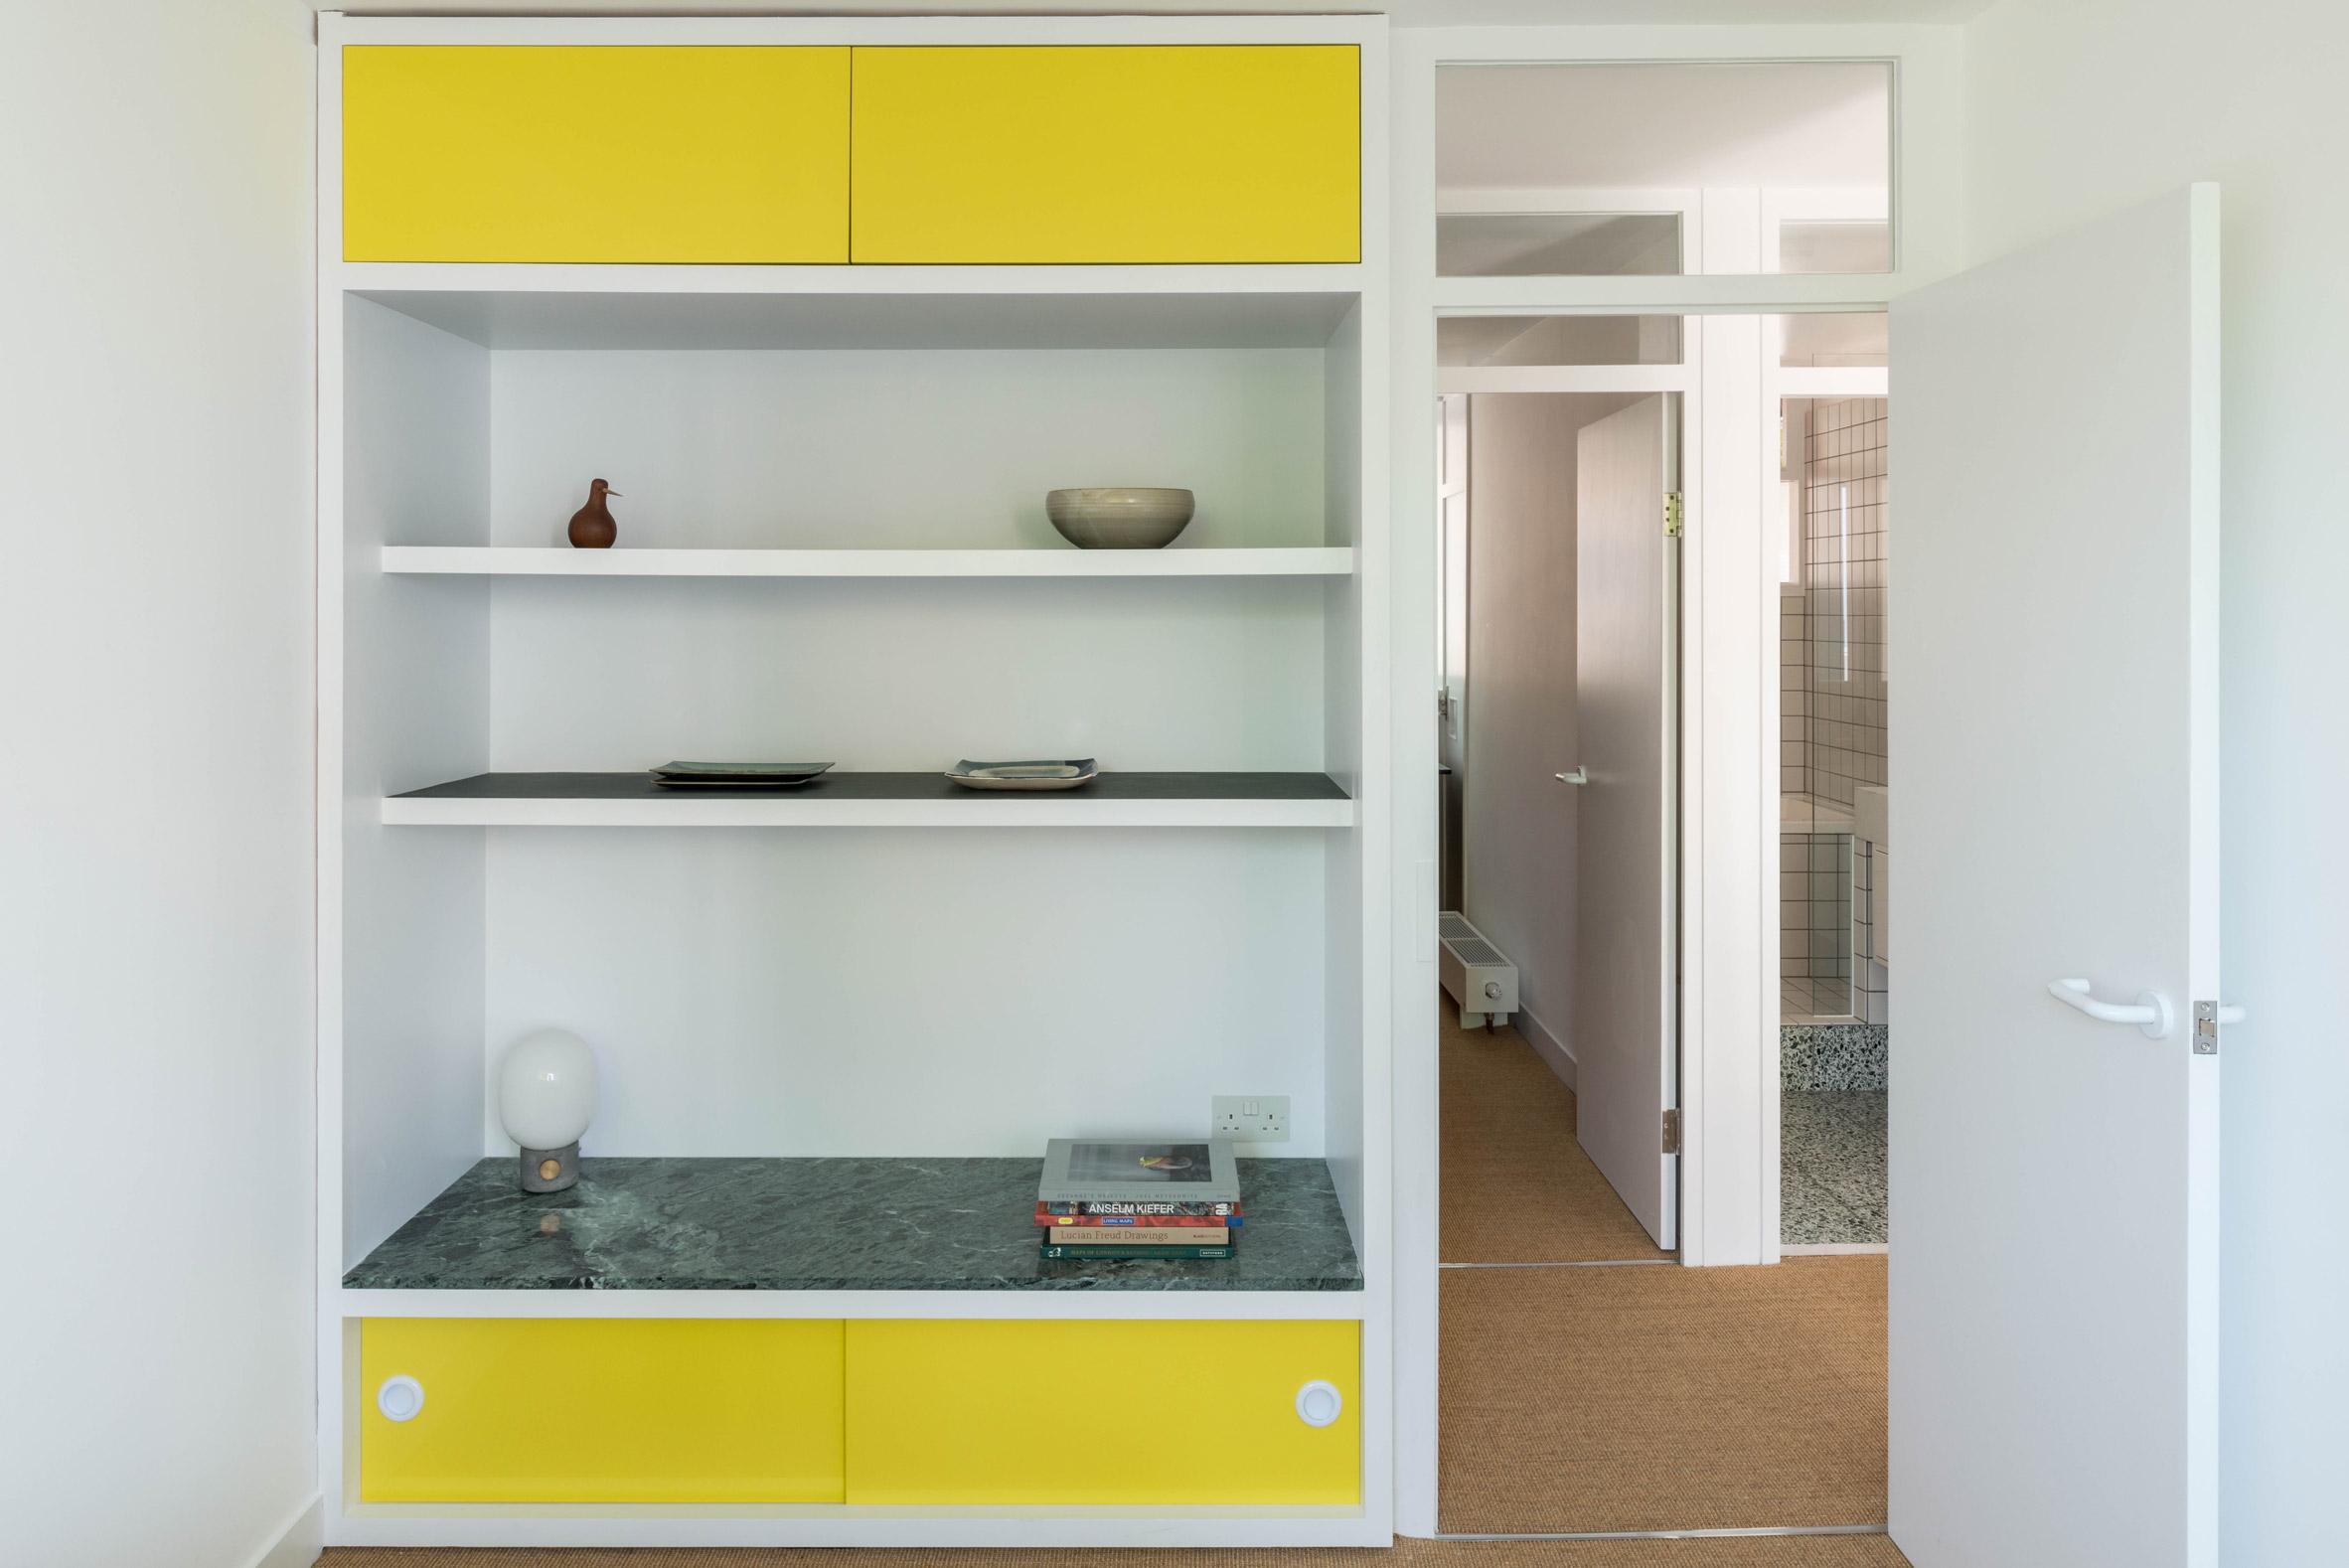 Bedroom shelving Golden Lane flat by Archmongers